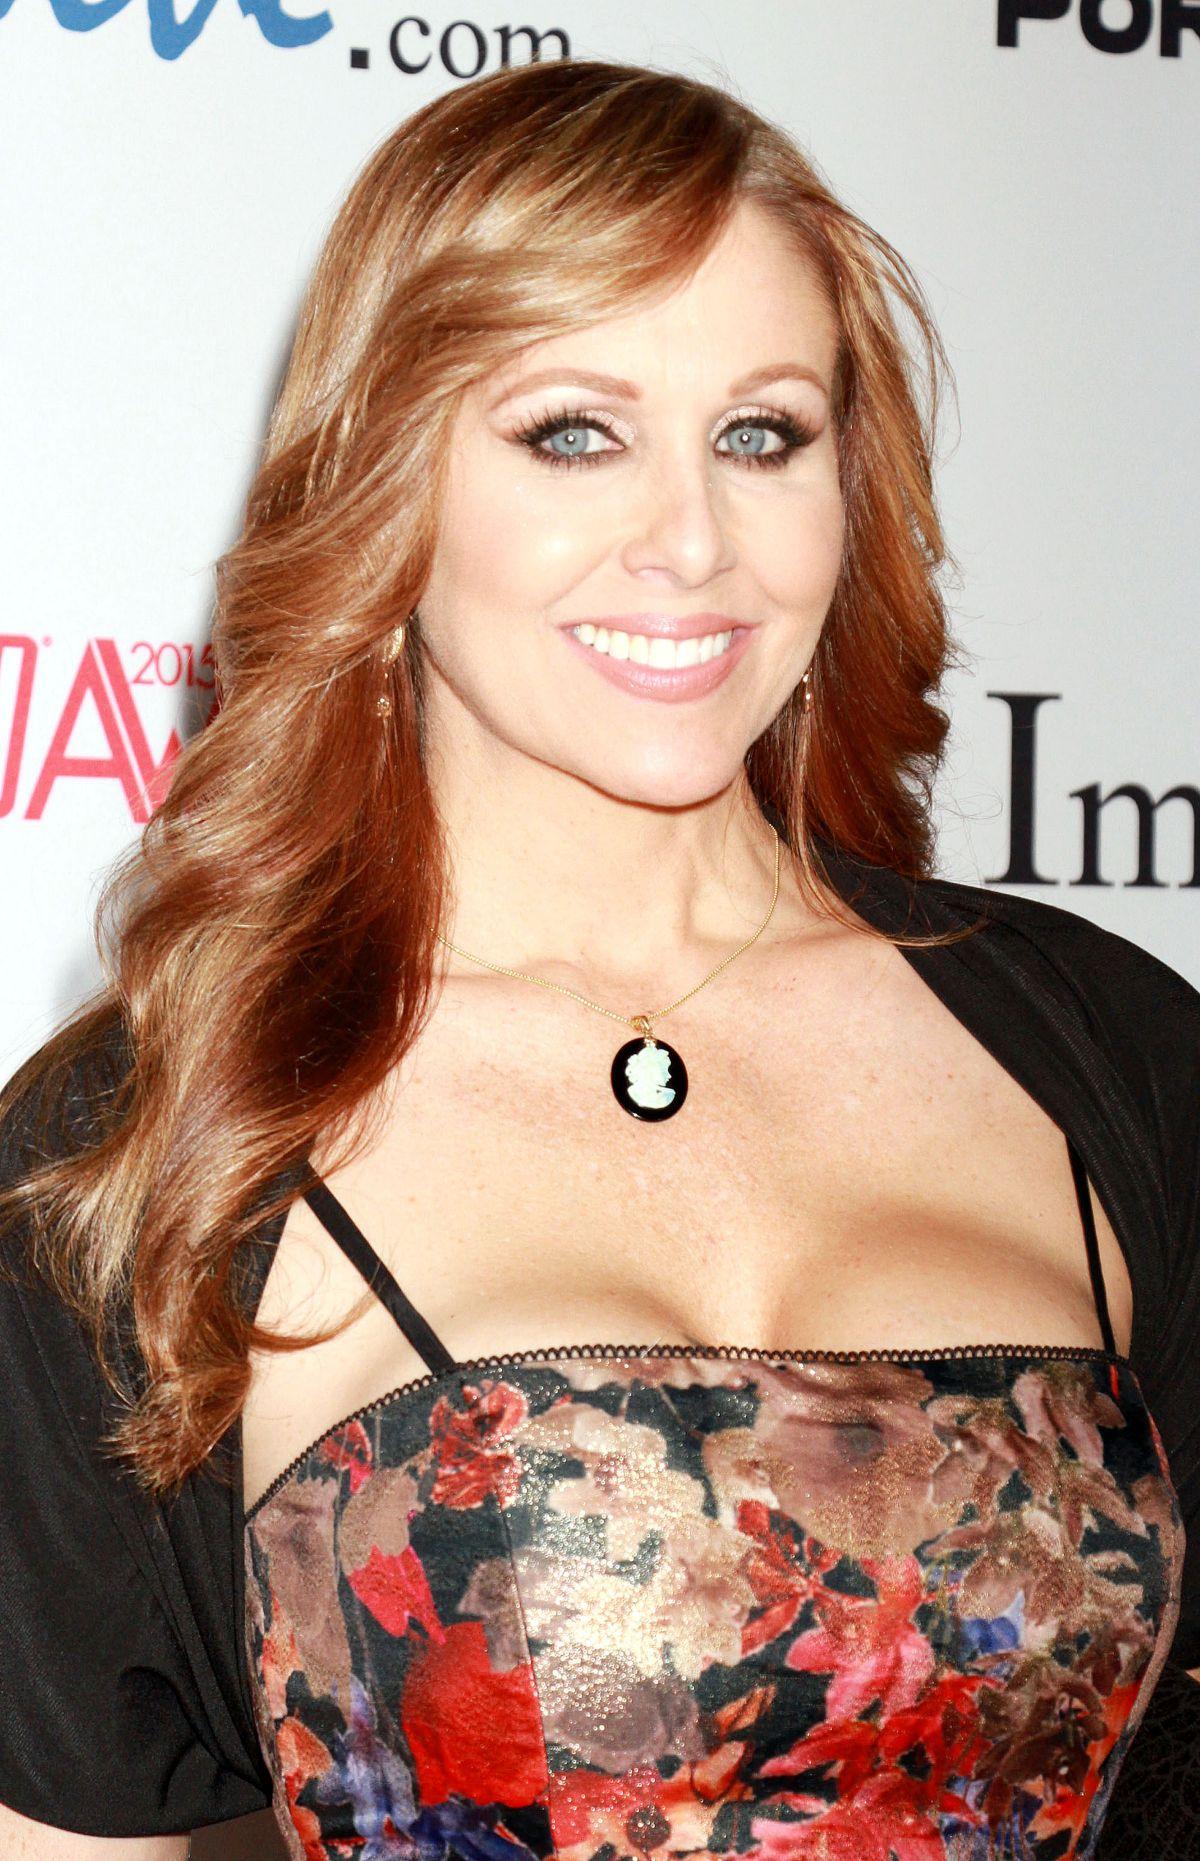 Porn Stars At The AVN Awards (47 pics) - Izismile.com